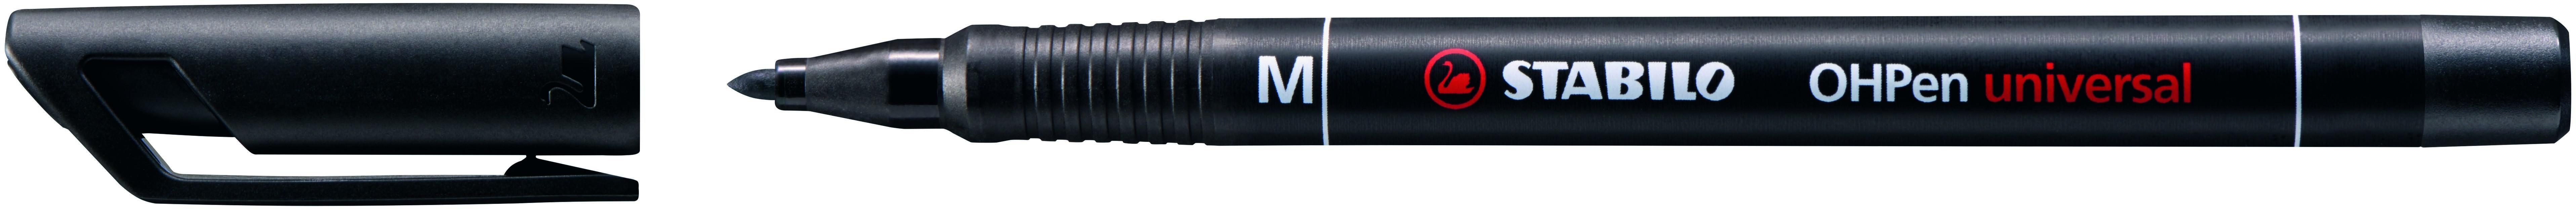 STABILO OHPEN - Marqueur permanent - pointe moyenne 1 mm - noir